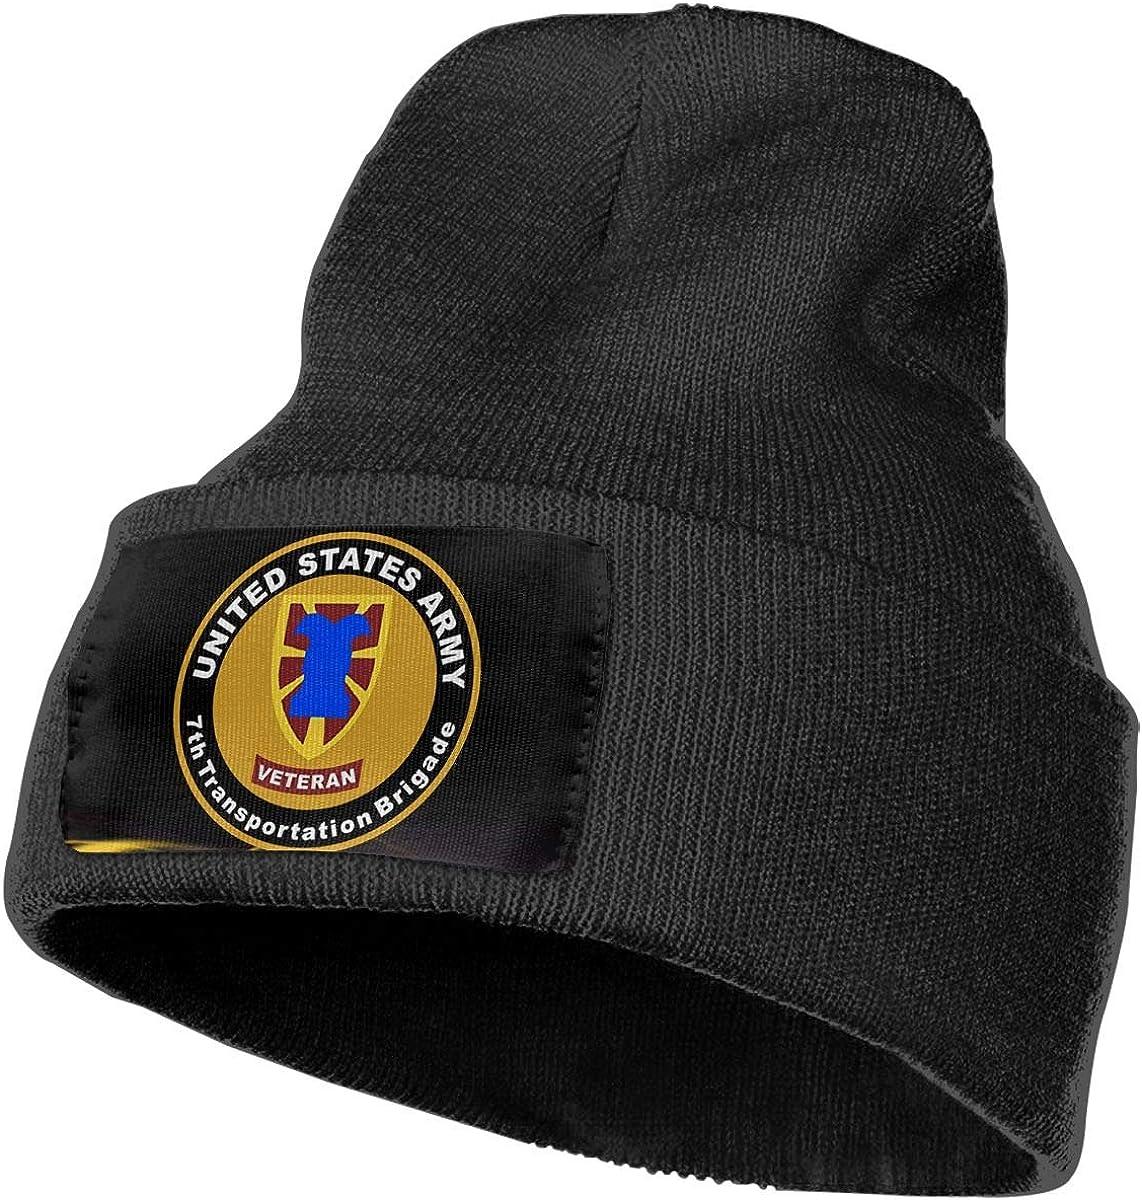 DFKD JKFD Unisex 3D Knitted Hat Skull Hat Beanie Cap Army Veteran 7th Transportation Brigade